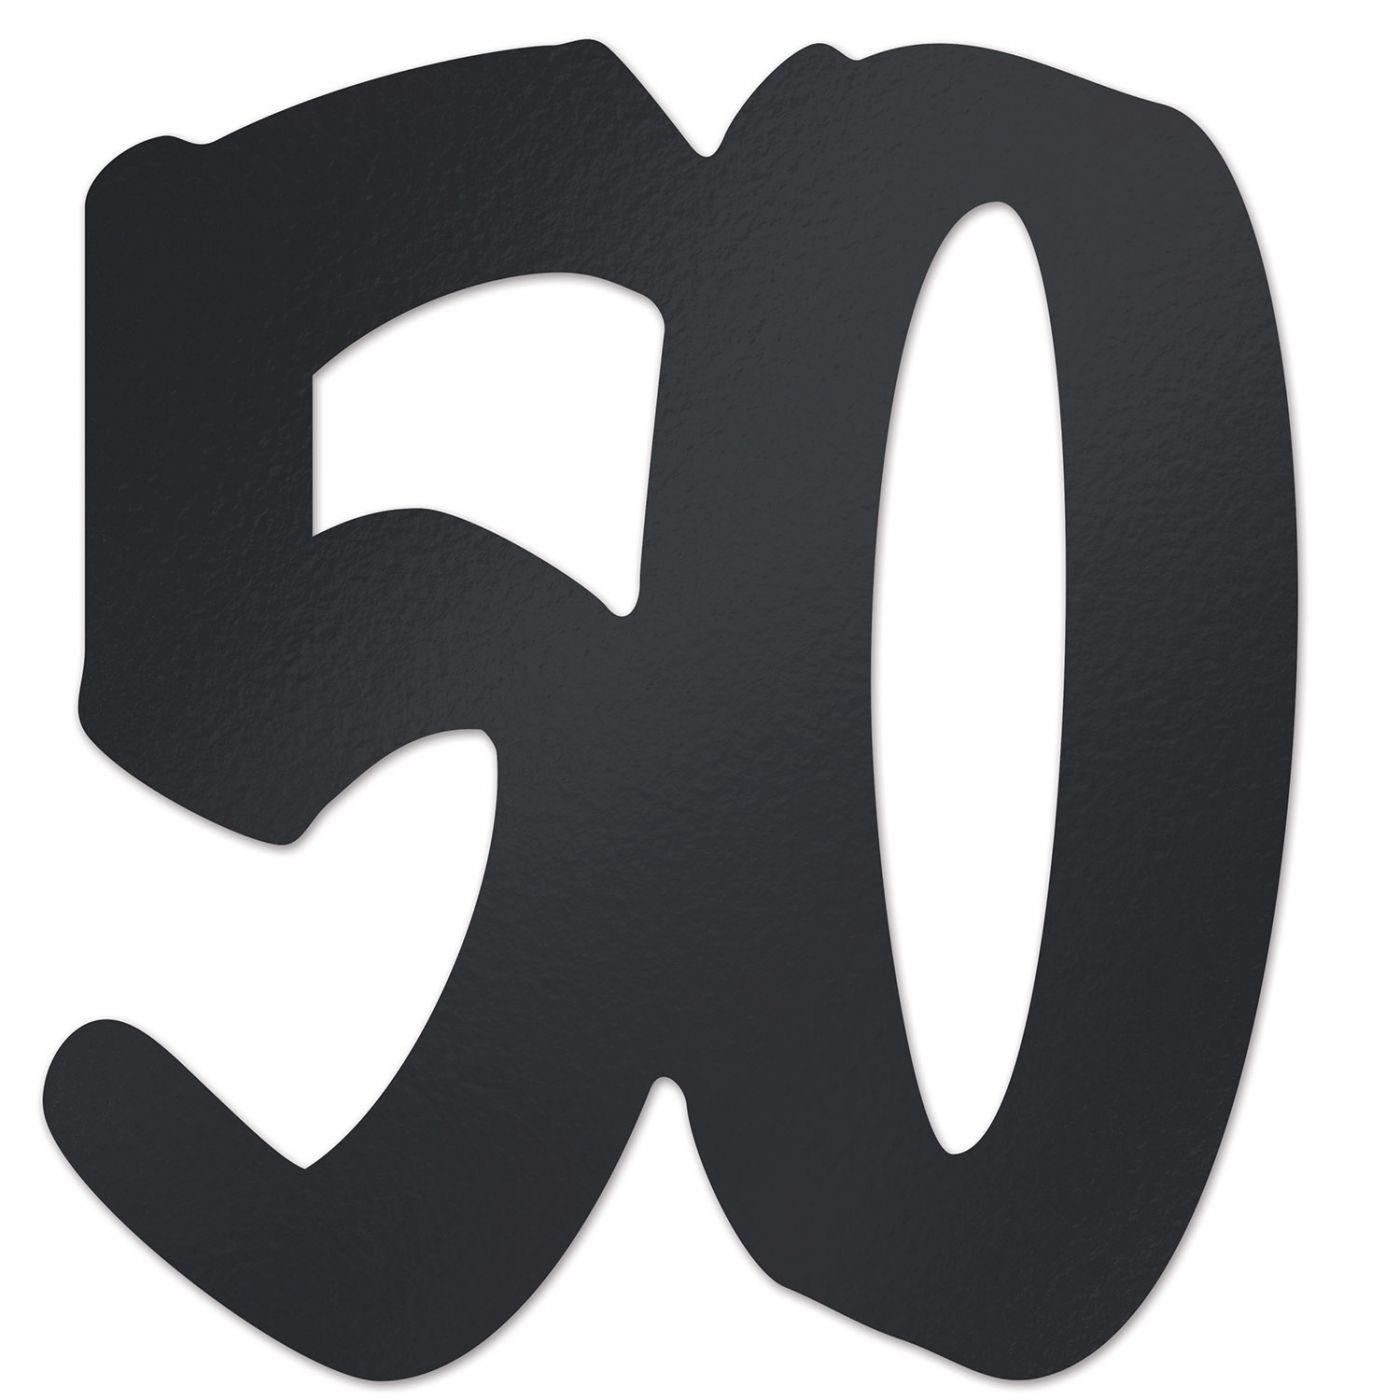 50  Foil Silhouette (24) image